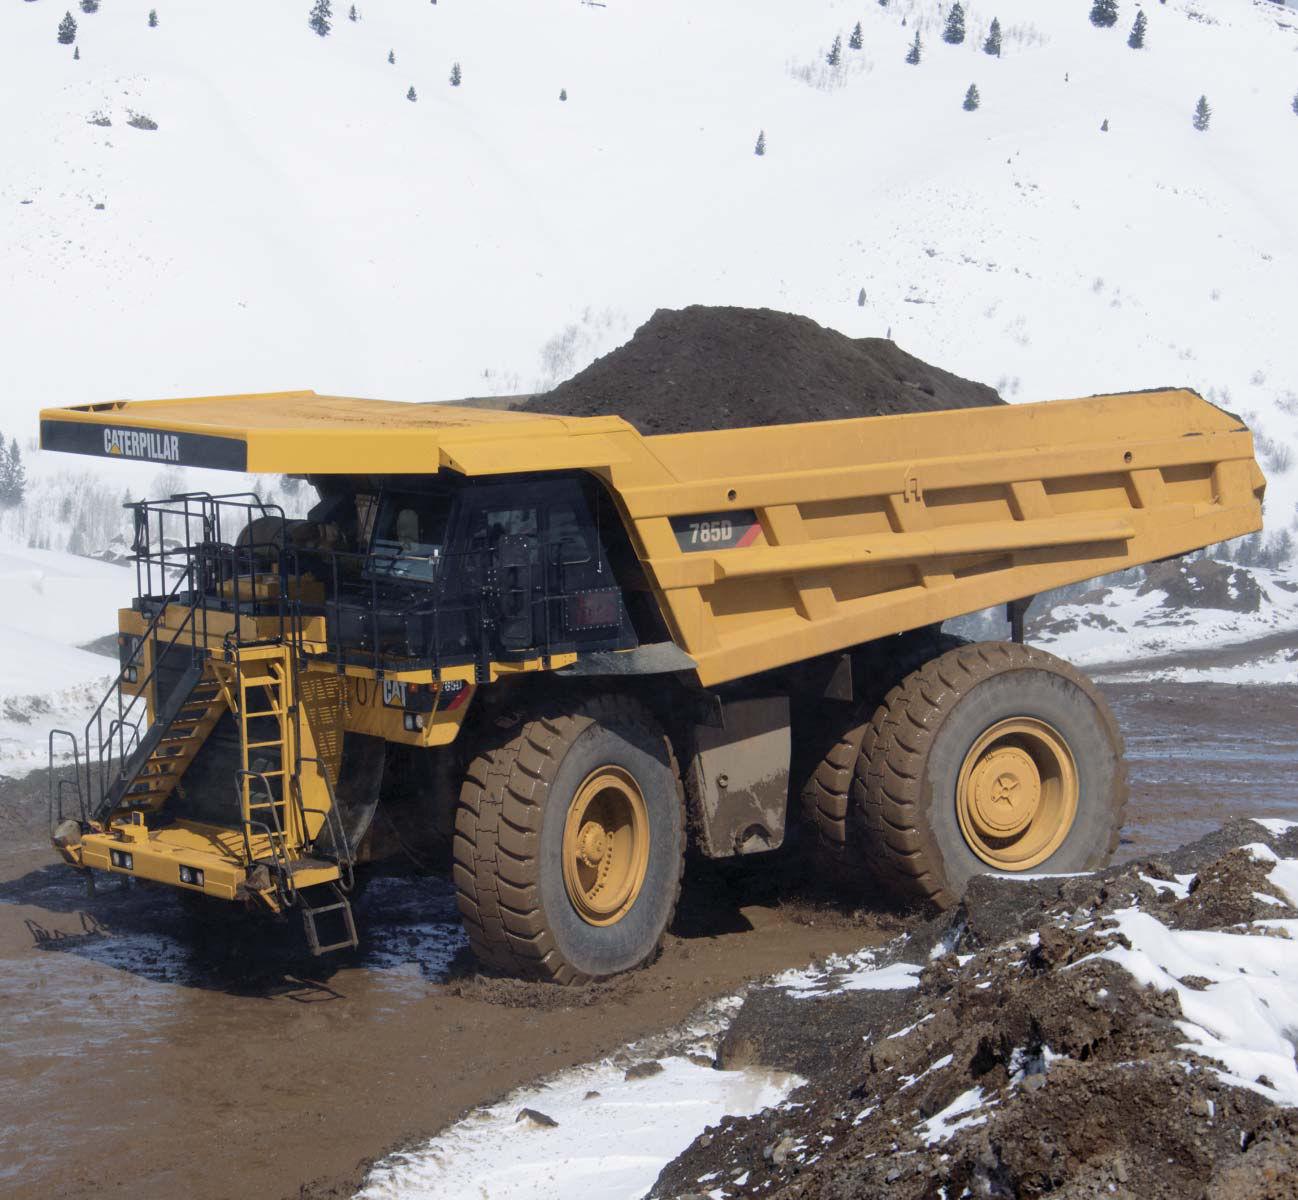 cat dump truck motor - igid dump truck / diesel / mining - 785D - aterpillar Global Mining